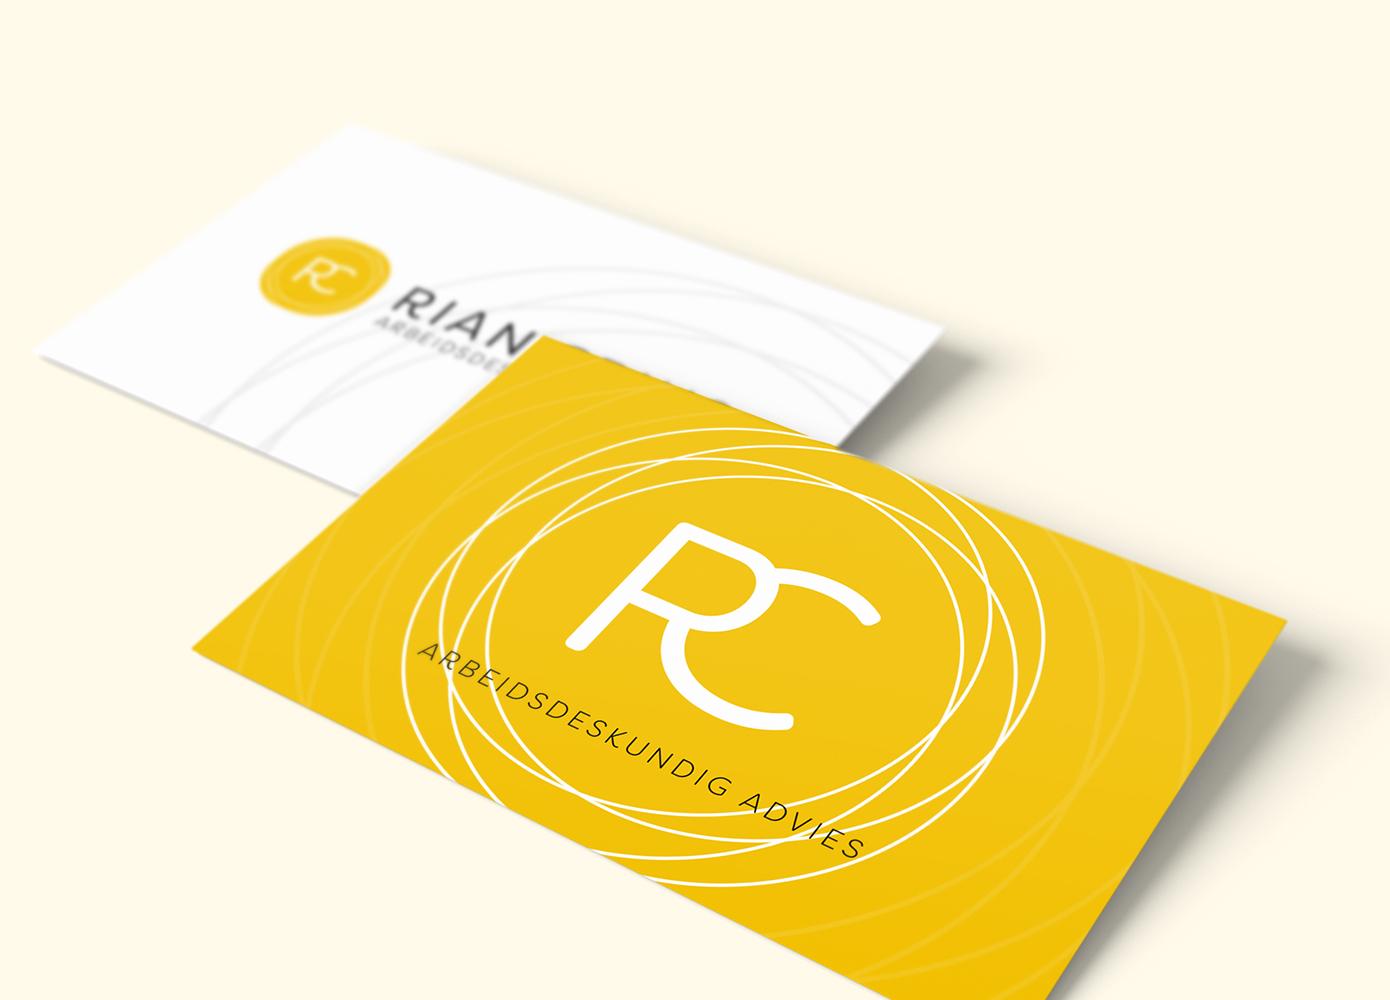 Visitekaart ontwerp Rian Crins